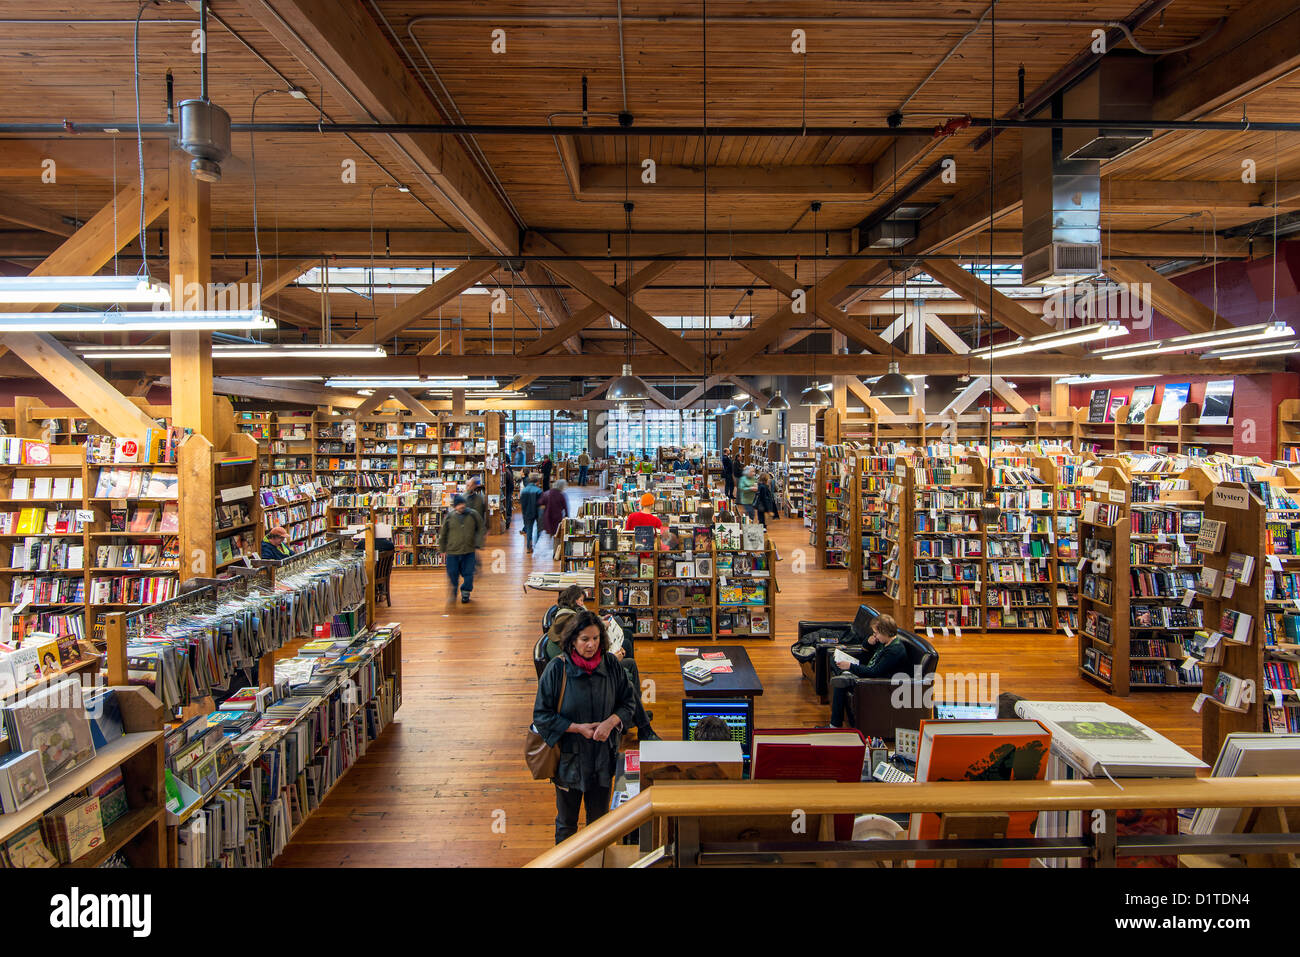 The Elliott Bay Book Company bookstore at Capitol Hill, Seattle, Washington, USA - Stock Image